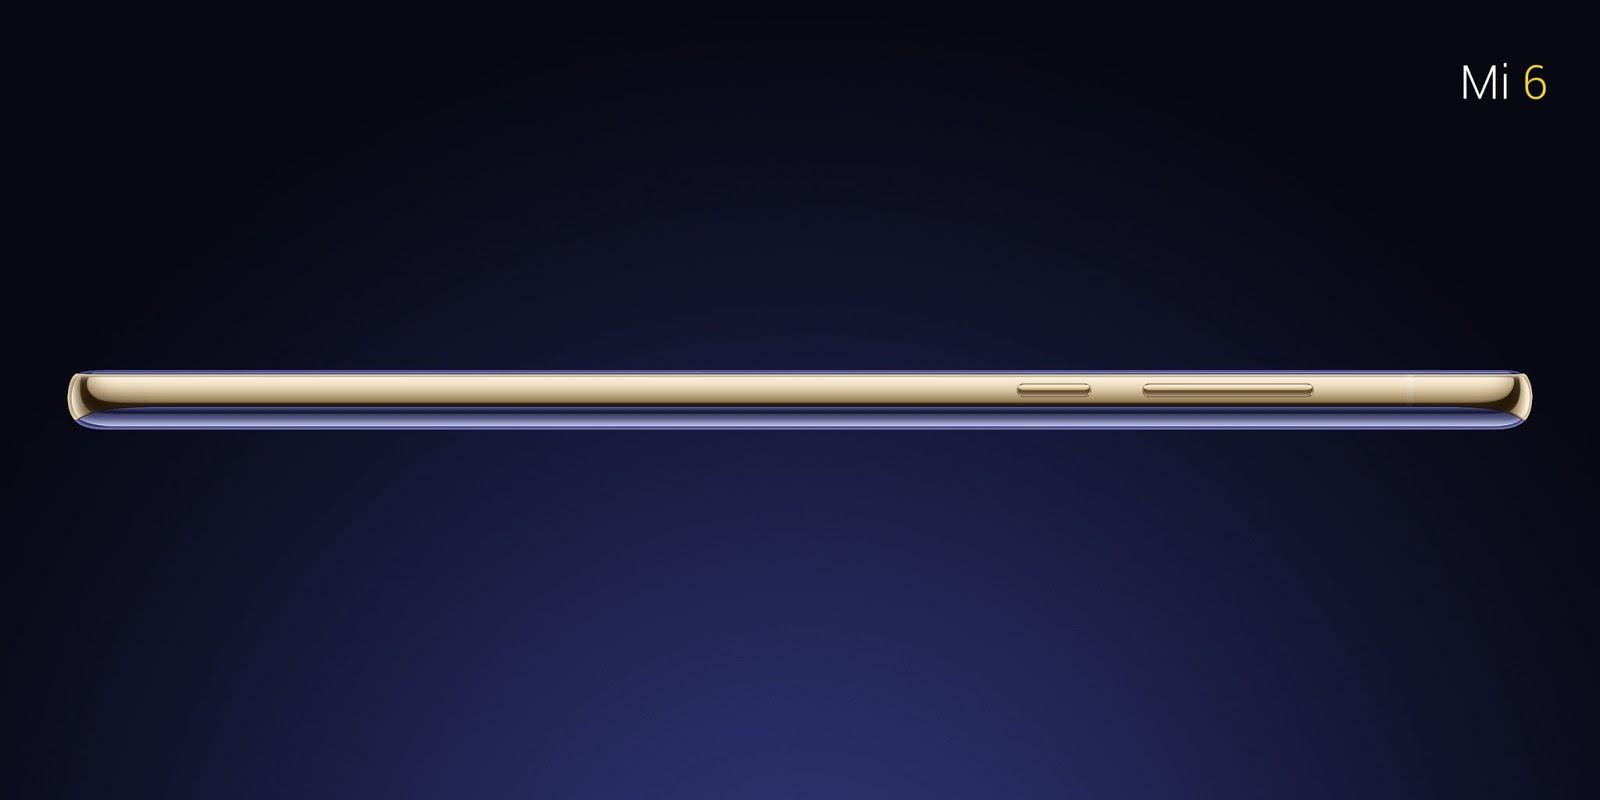 Дождались: Xiaomi Mi 6 представлен официально - 5